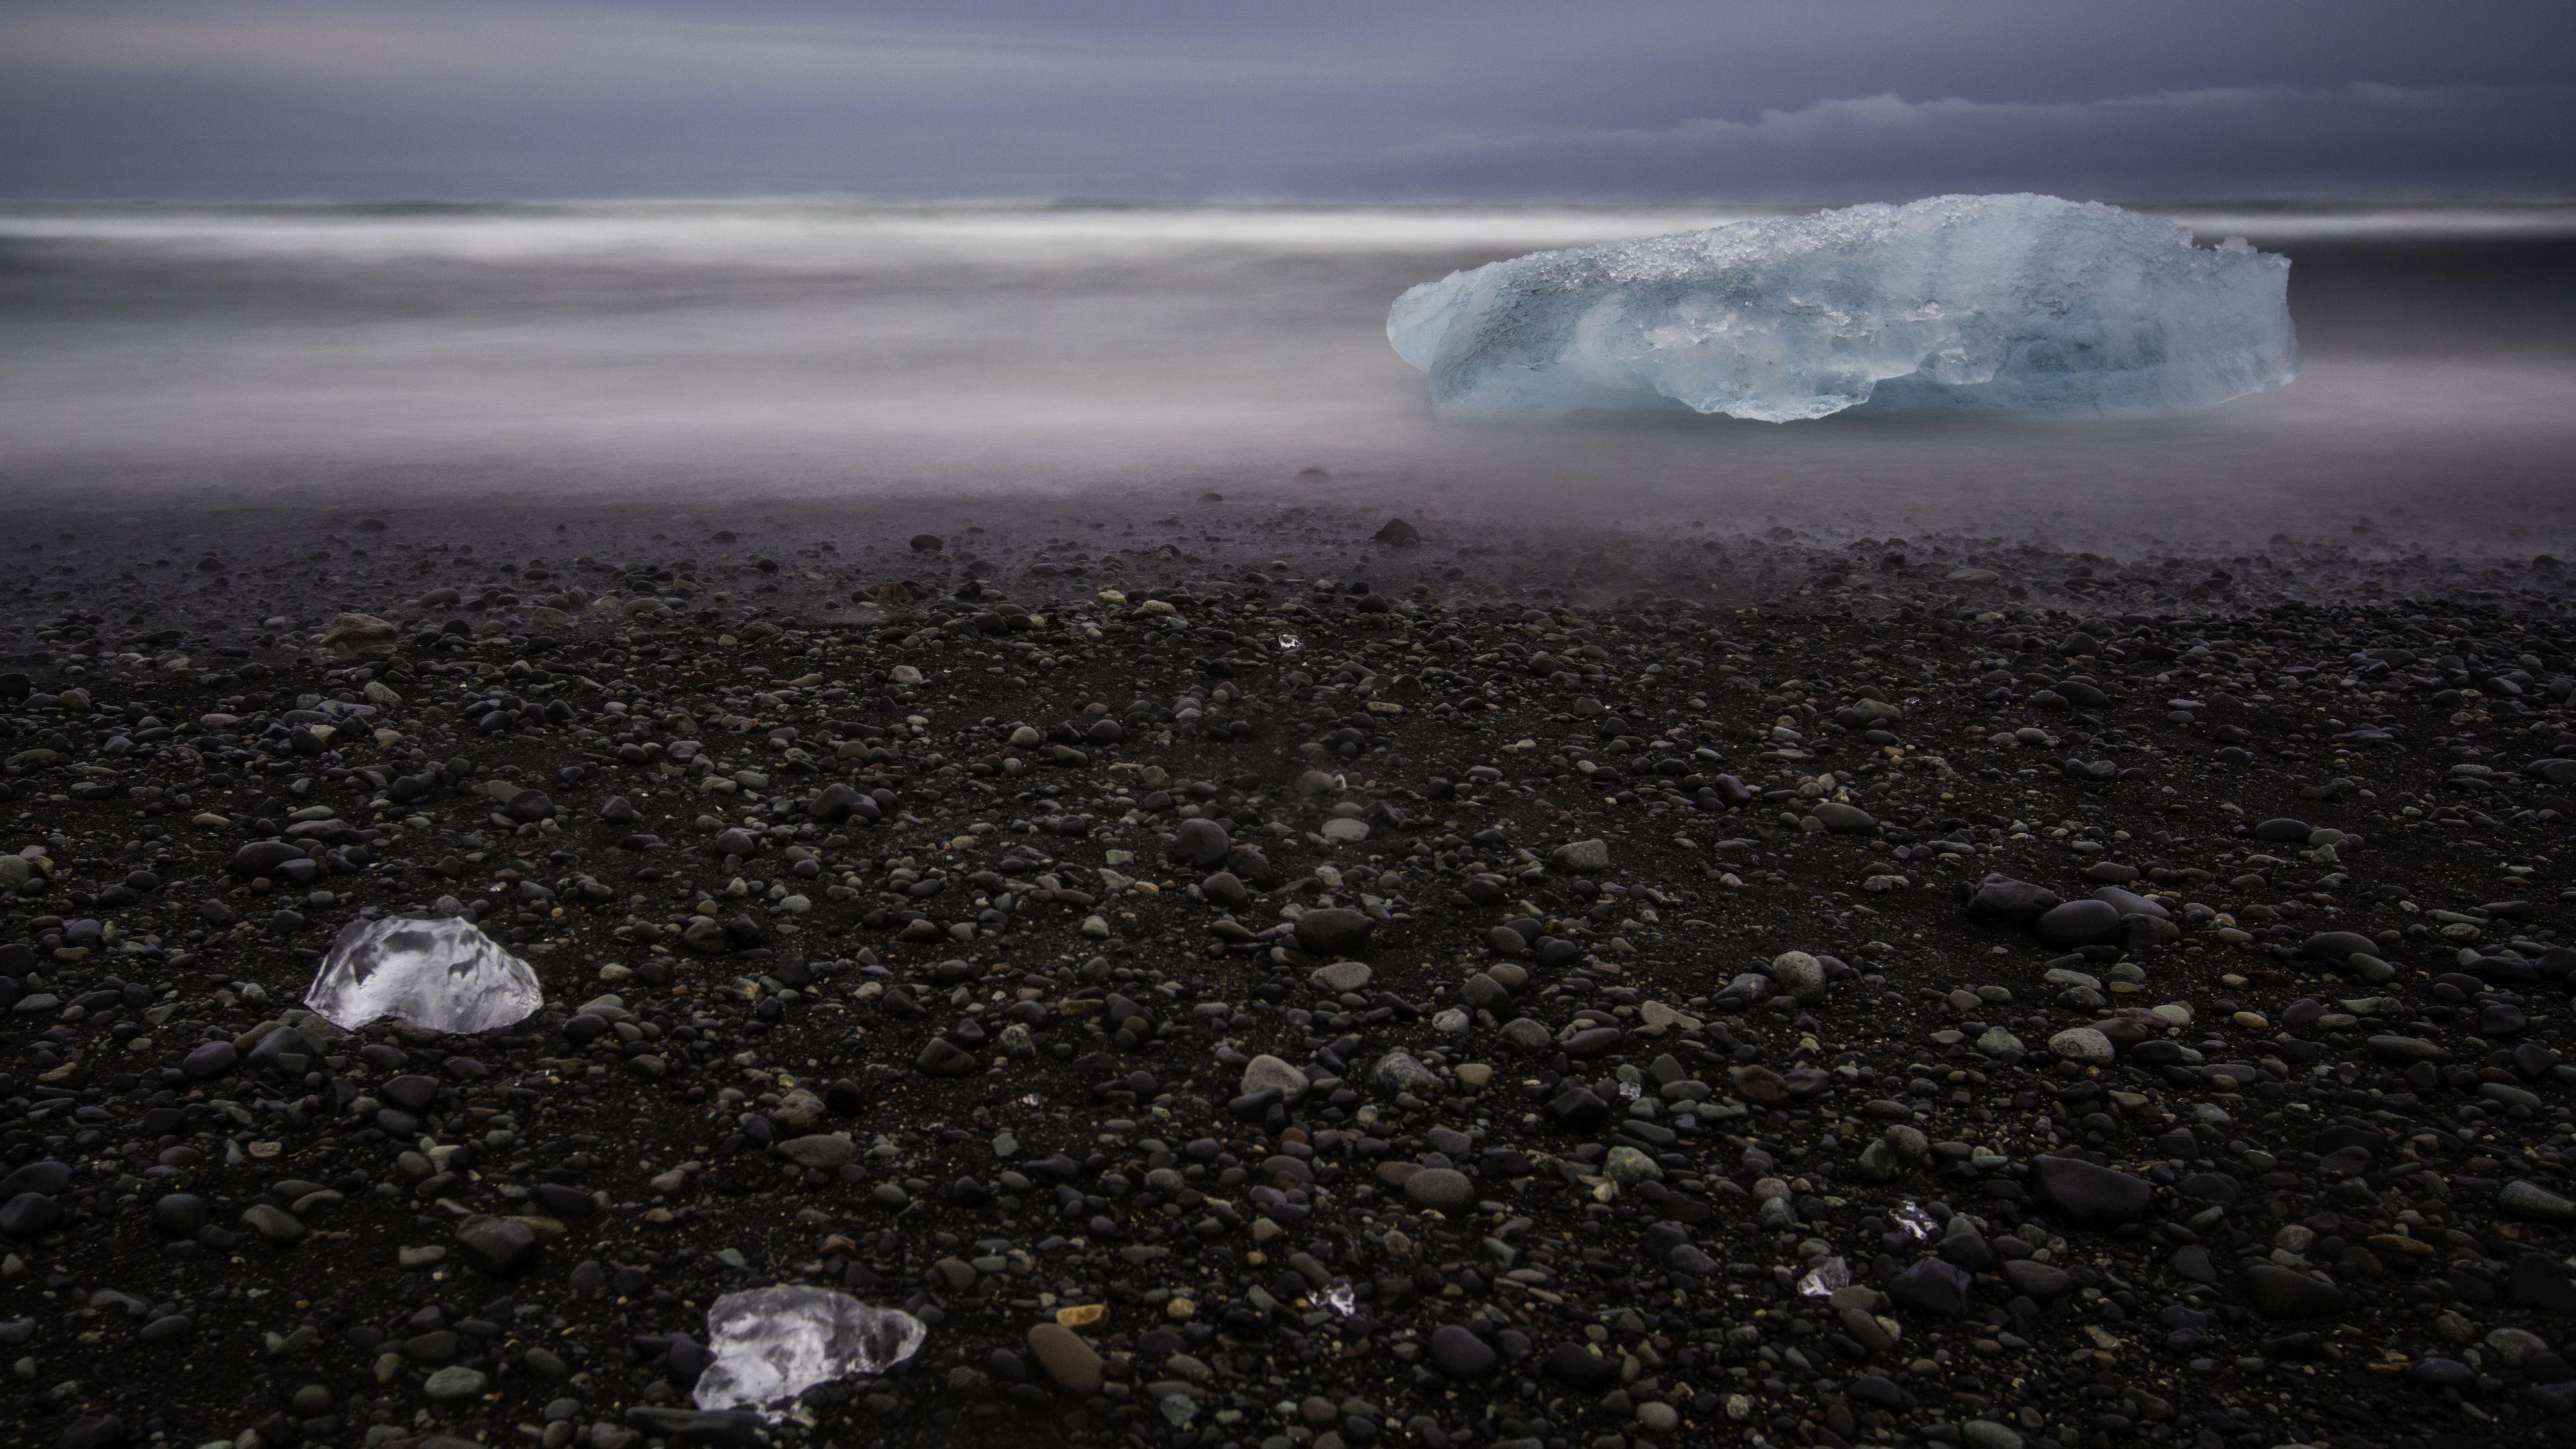 iceland 4k wallpaper - photo #24